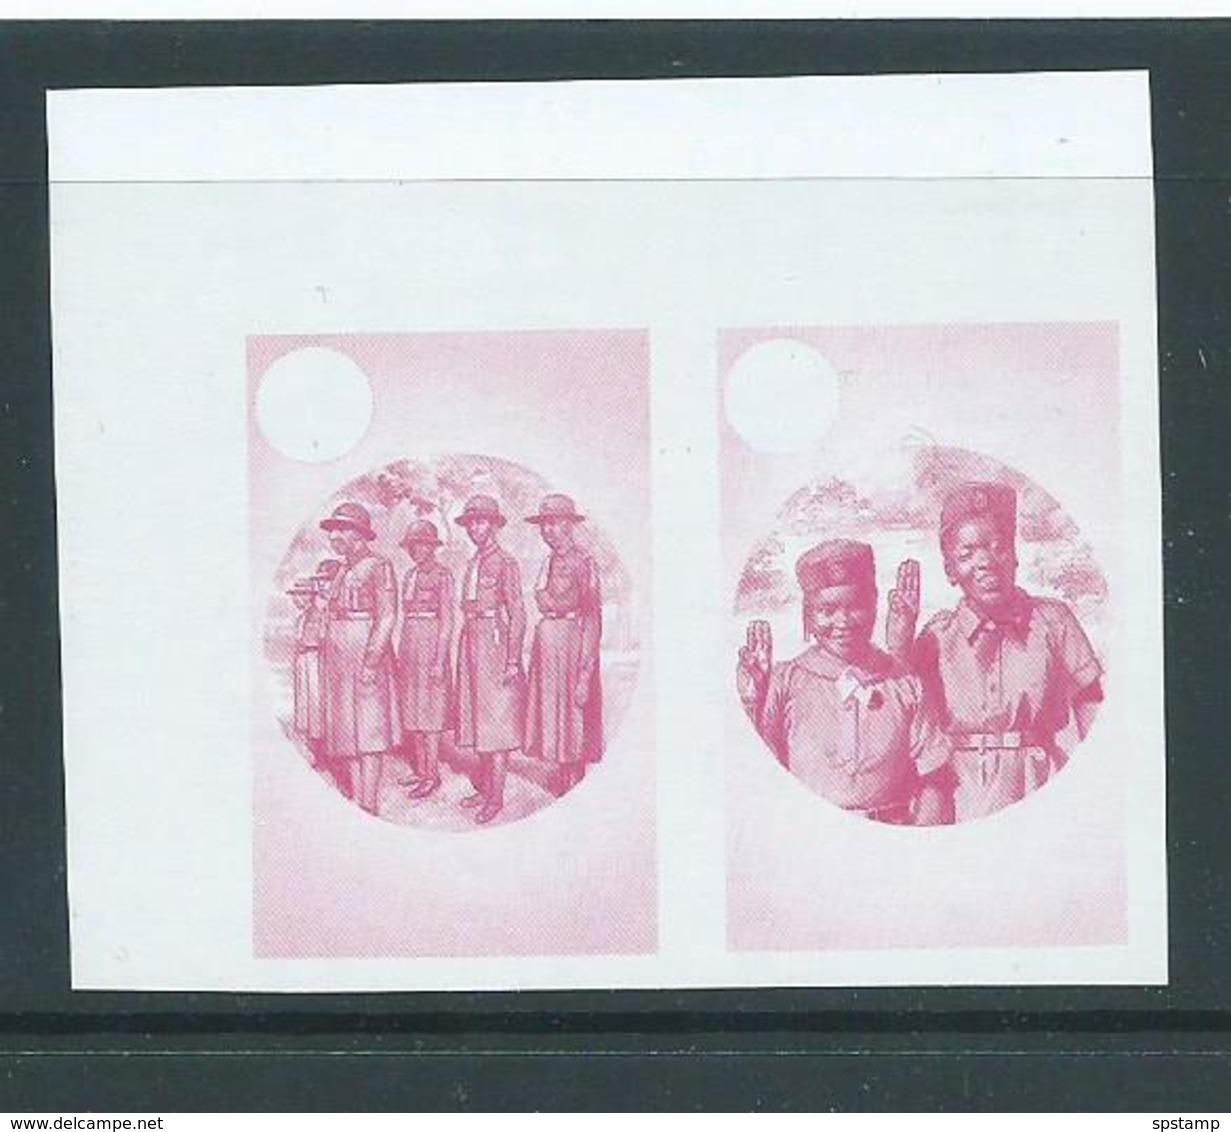 Montserrat 1986 Girl Guide Anniversary $1.15 Value 7 X Imperforate Colour Trial Proofs MNH - Montserrat